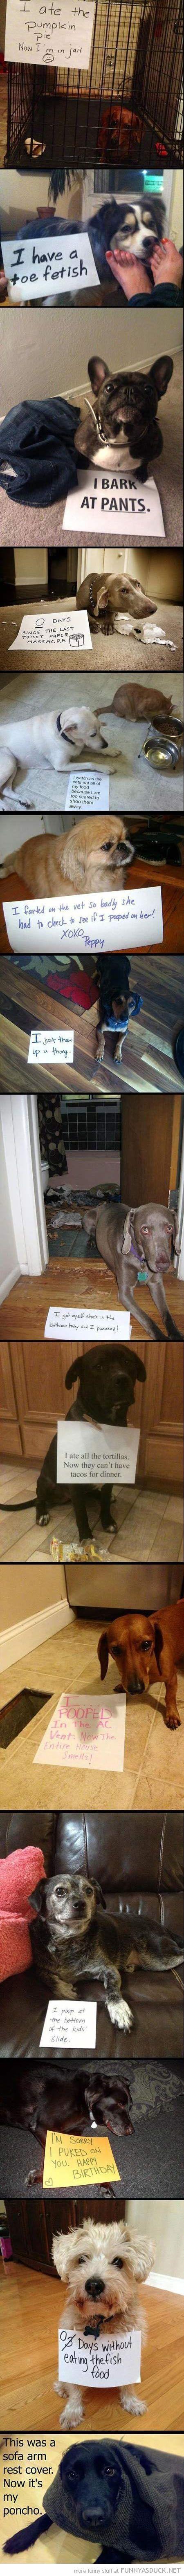 dog animal shaming confession signs compilation